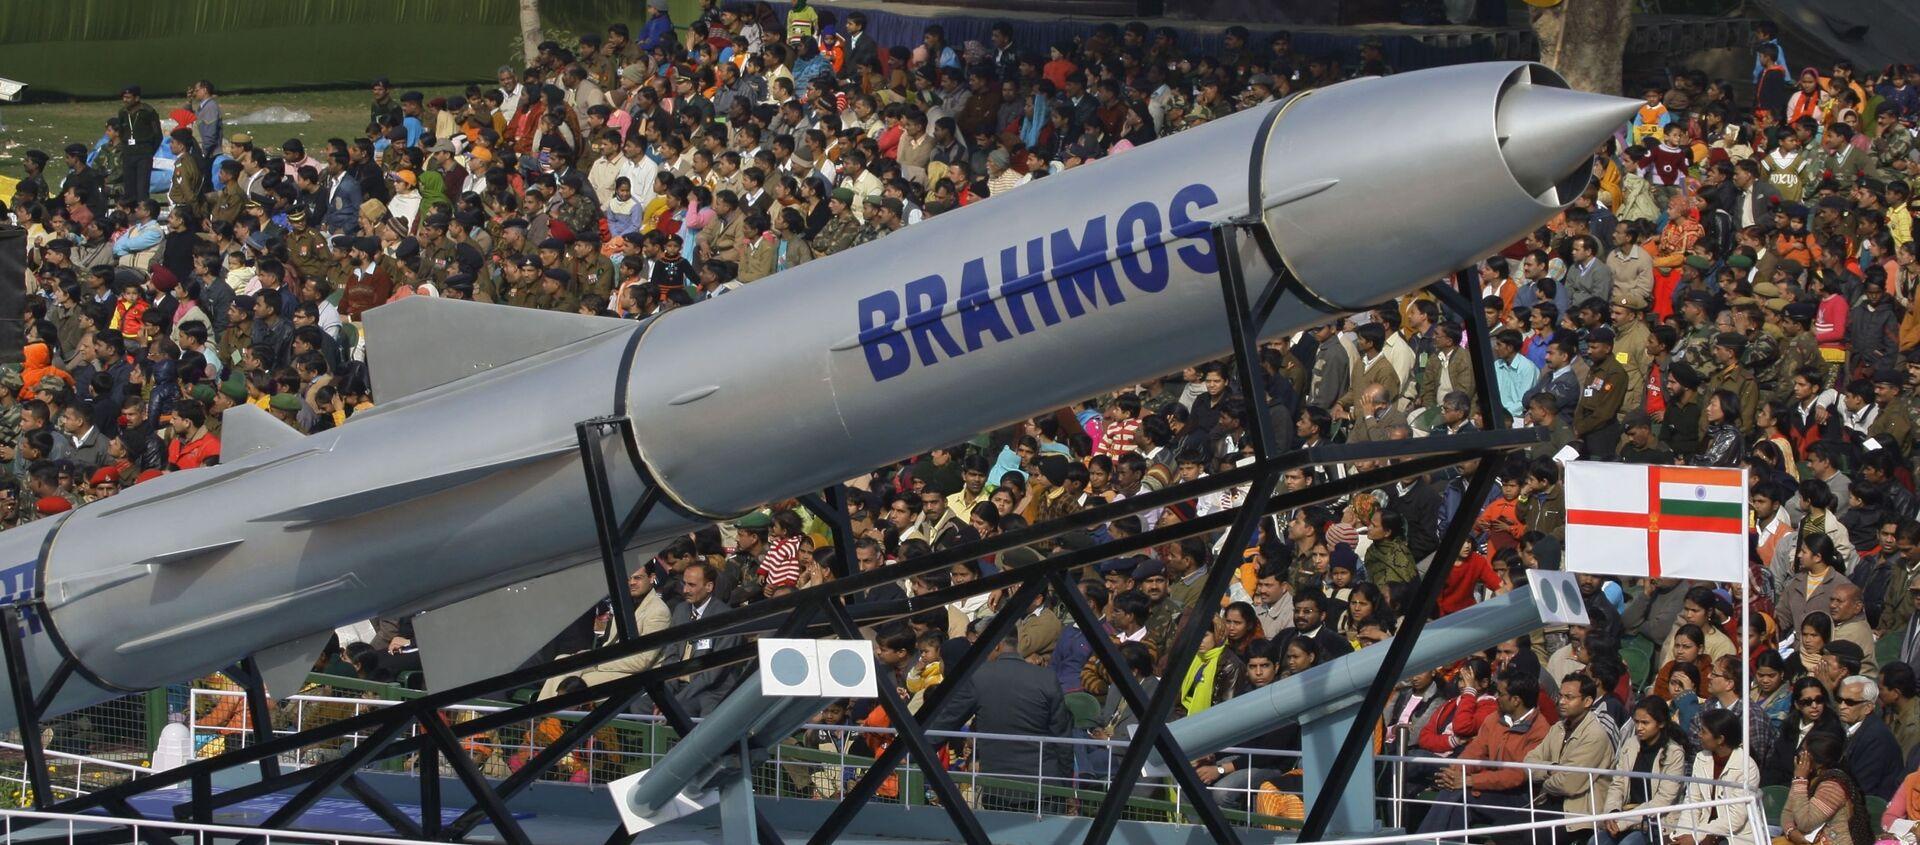 Tên lửa BrahMos - Sputnik Việt Nam, 1920, 26.06.2021